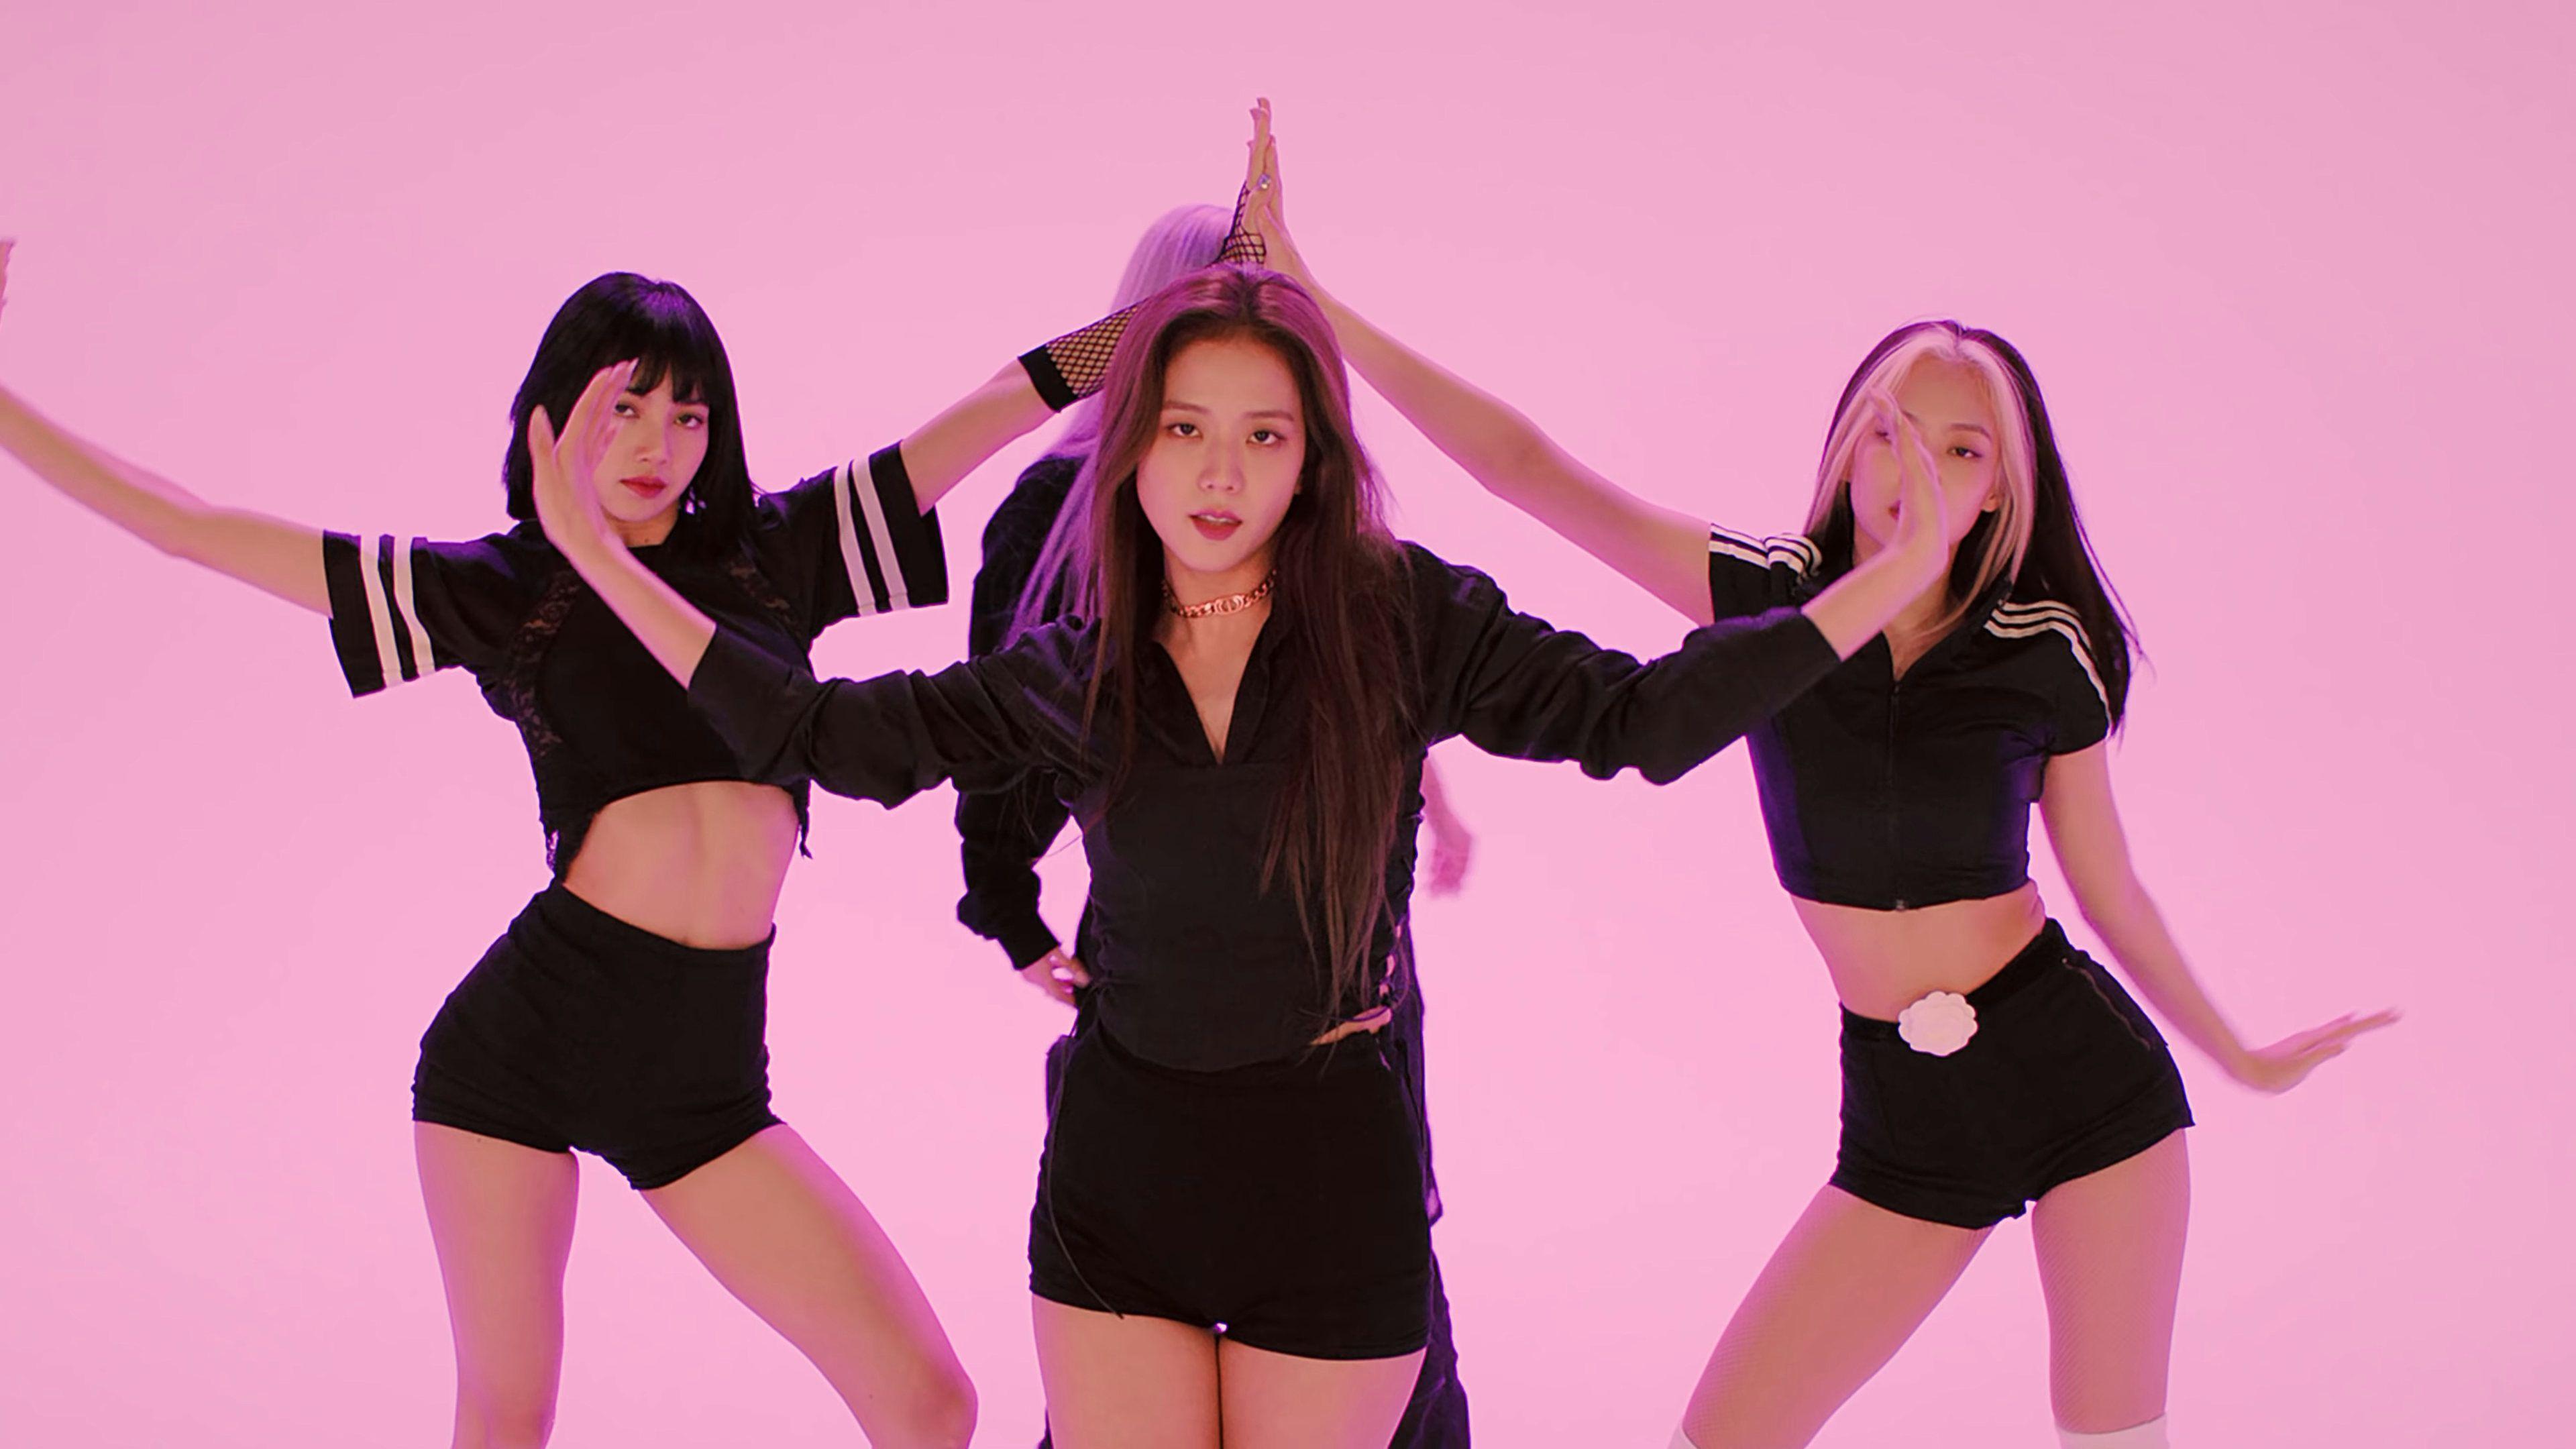 Blackpink How You Like That Dance Performance Mv Screencaps 4k Black Pink Songs Blackpink Video Black Pink Kpop